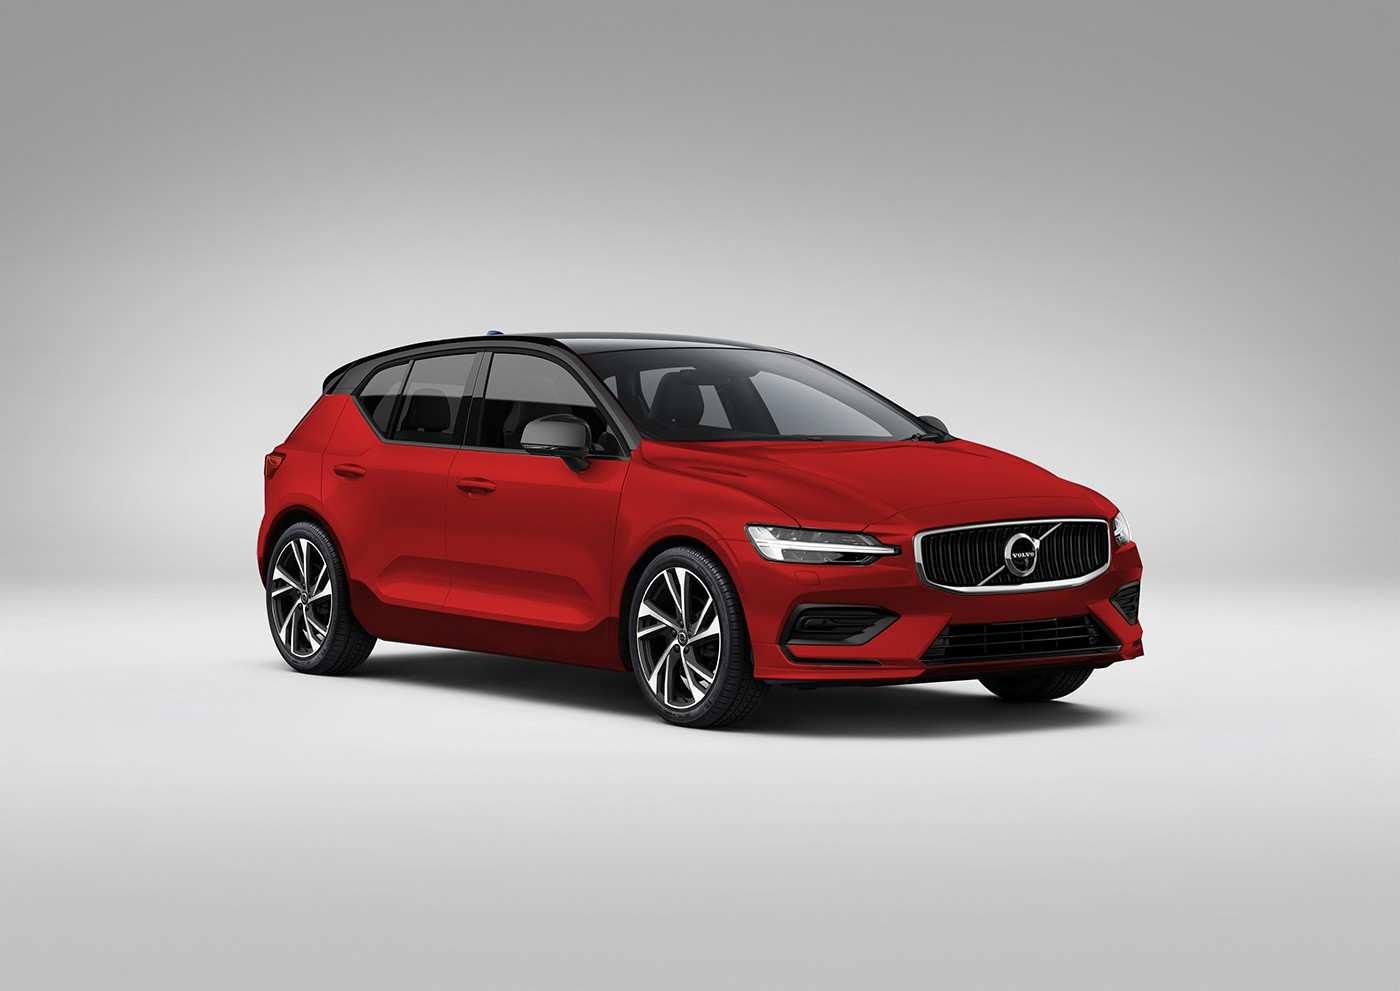 96 Concept of Volvo 2020 V40 Spesification with Volvo 2020 V40